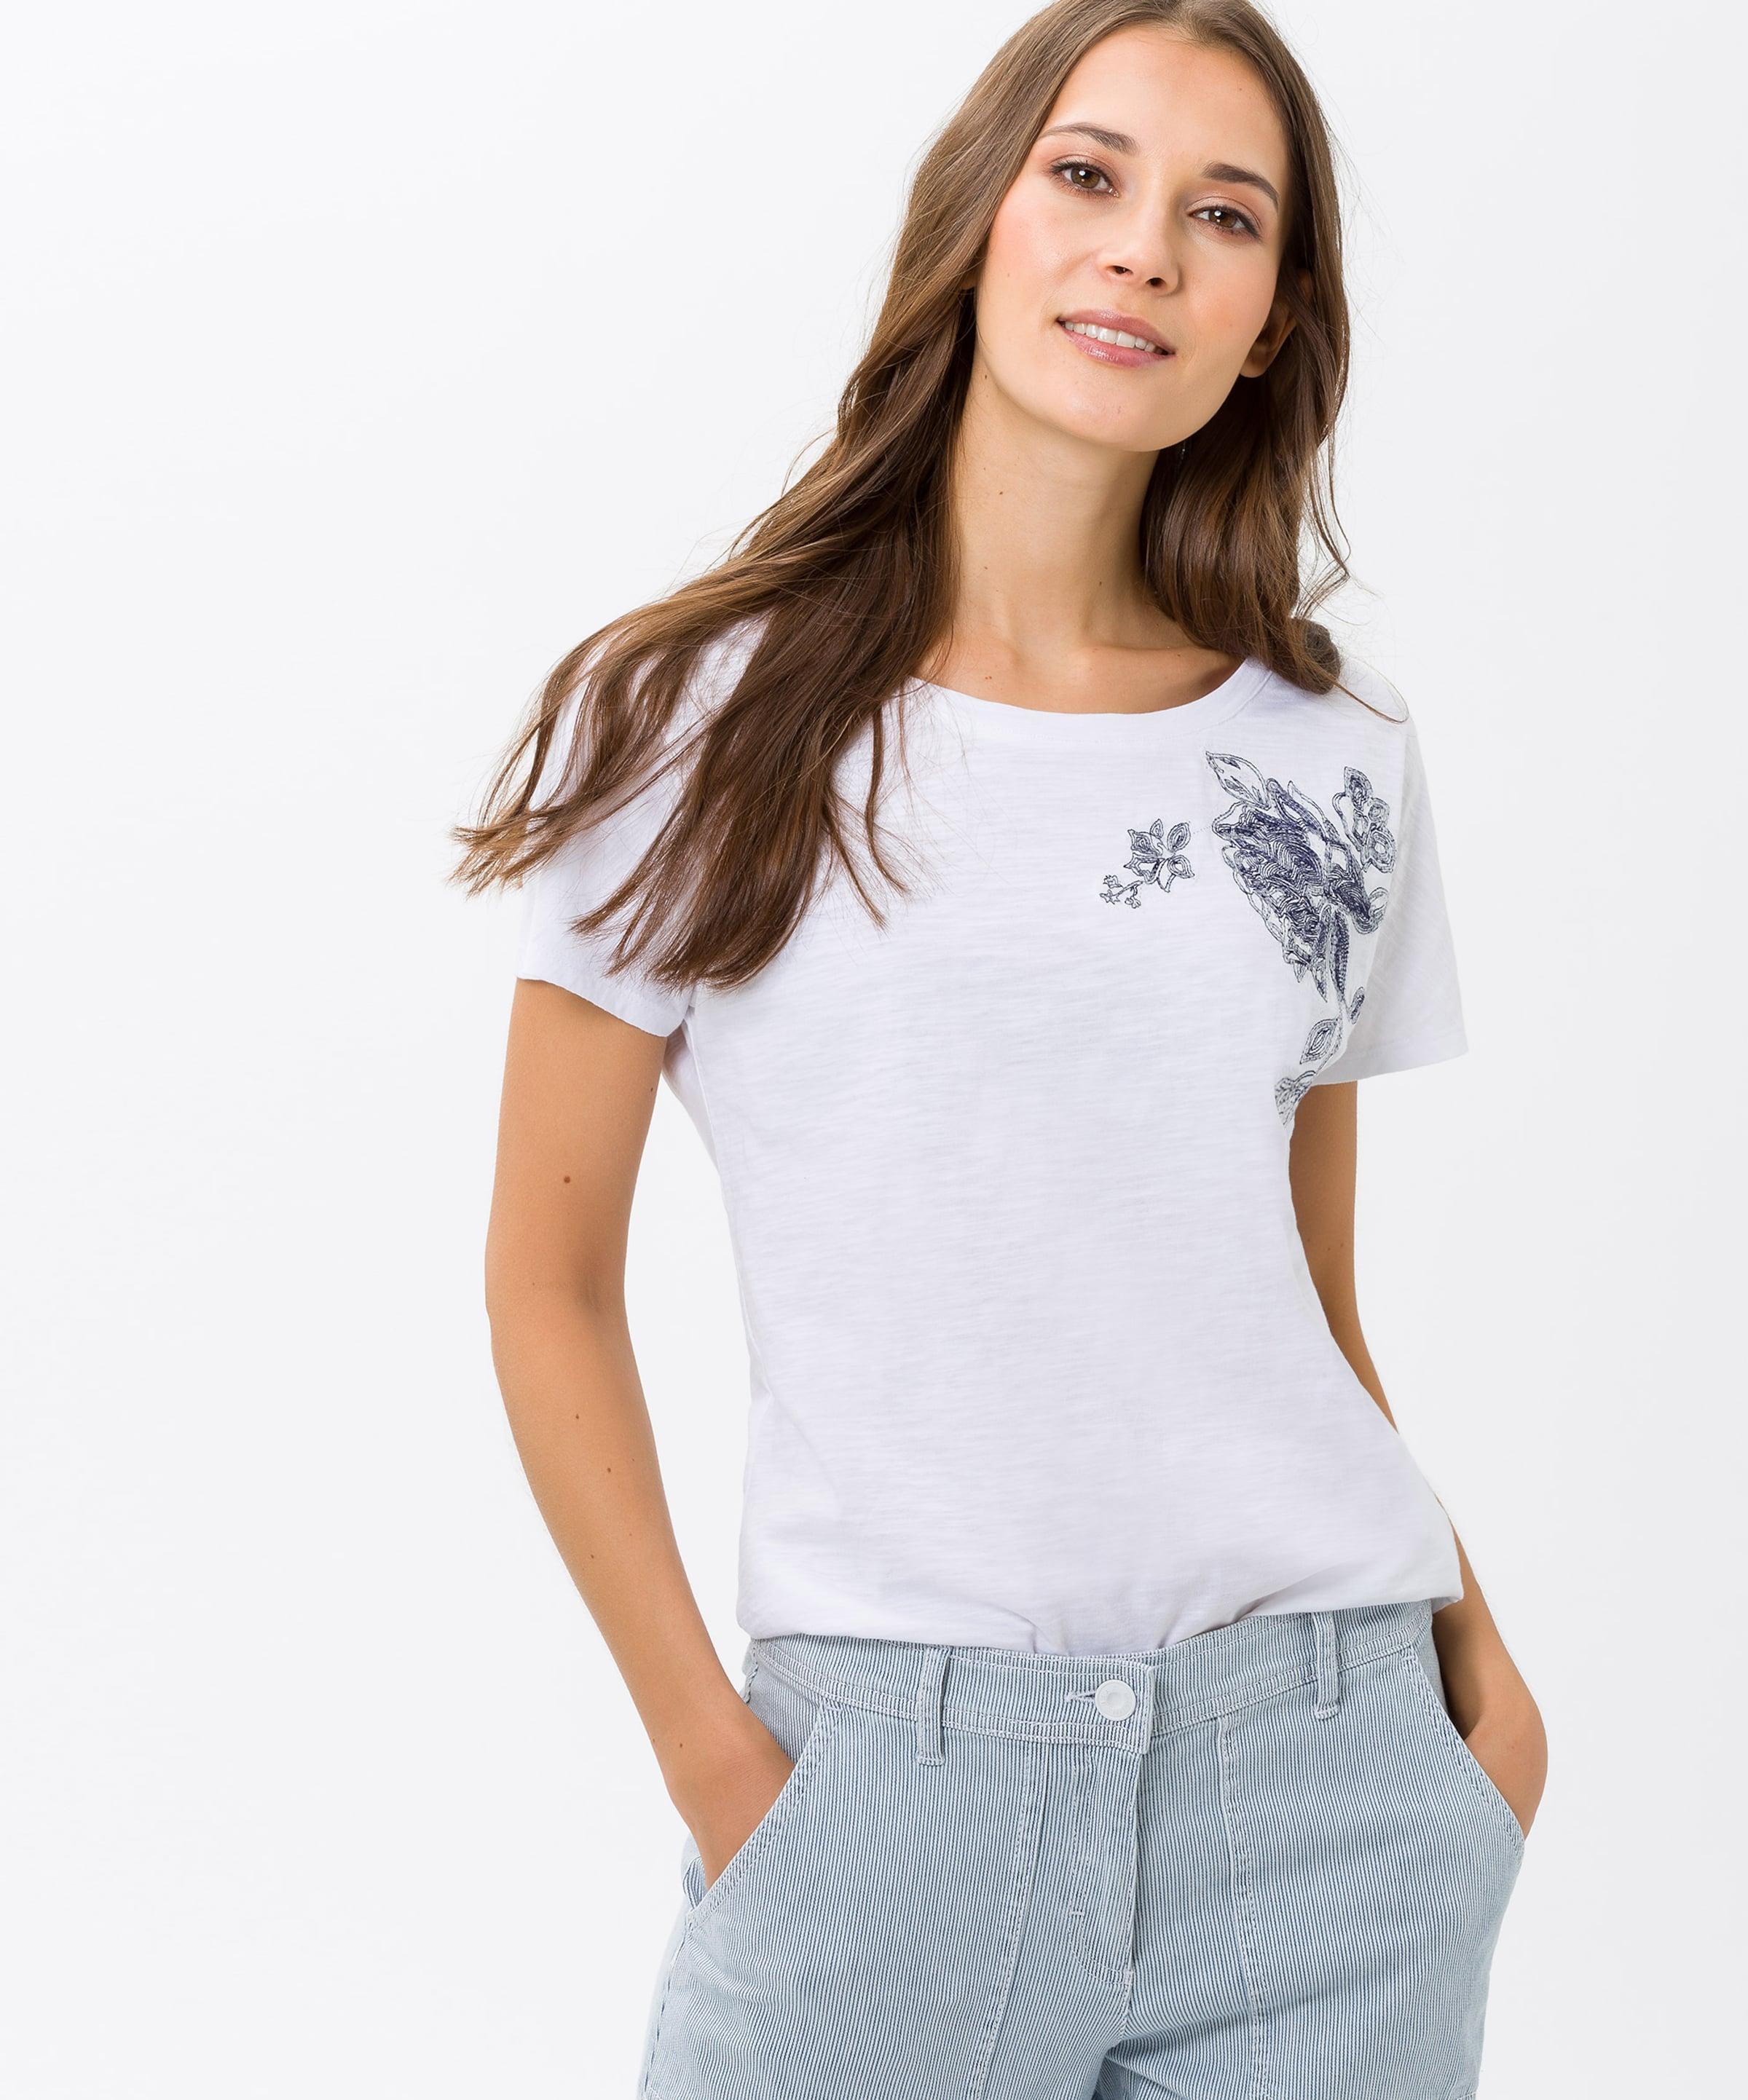 Brax In Shirt Shirt 'caelen' Weiß Weiß Brax 'caelen' Brax In IEH9YDW2